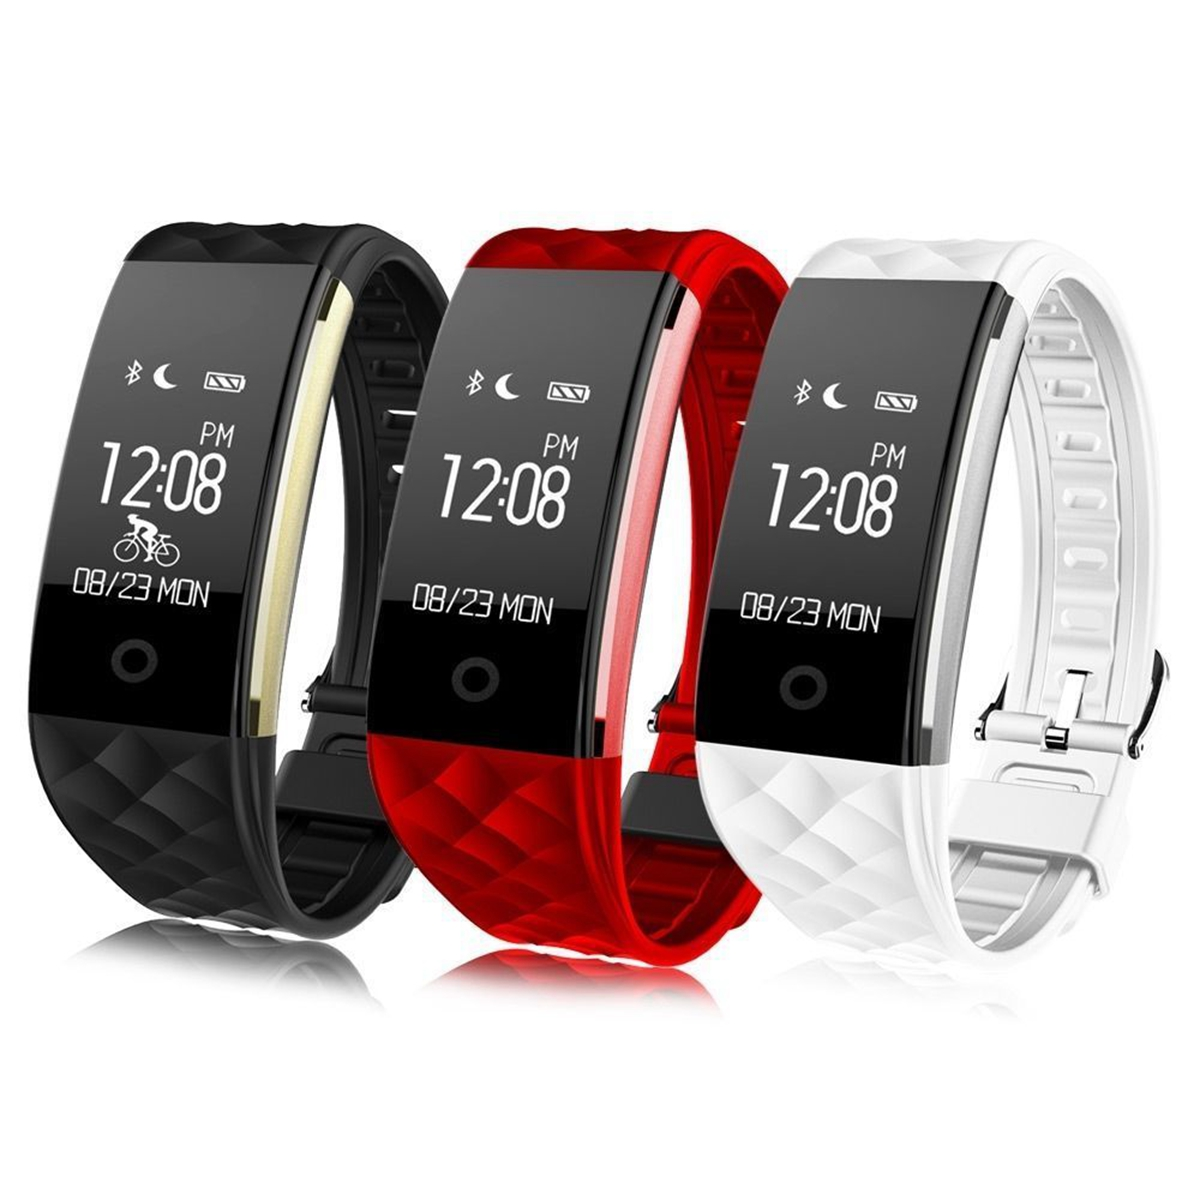 Bluetooth Digital Watches Men Women Heart Rate GPS Sport Track LED Watches Fitness Pedometer Smart Watch Bracelet Military Clock